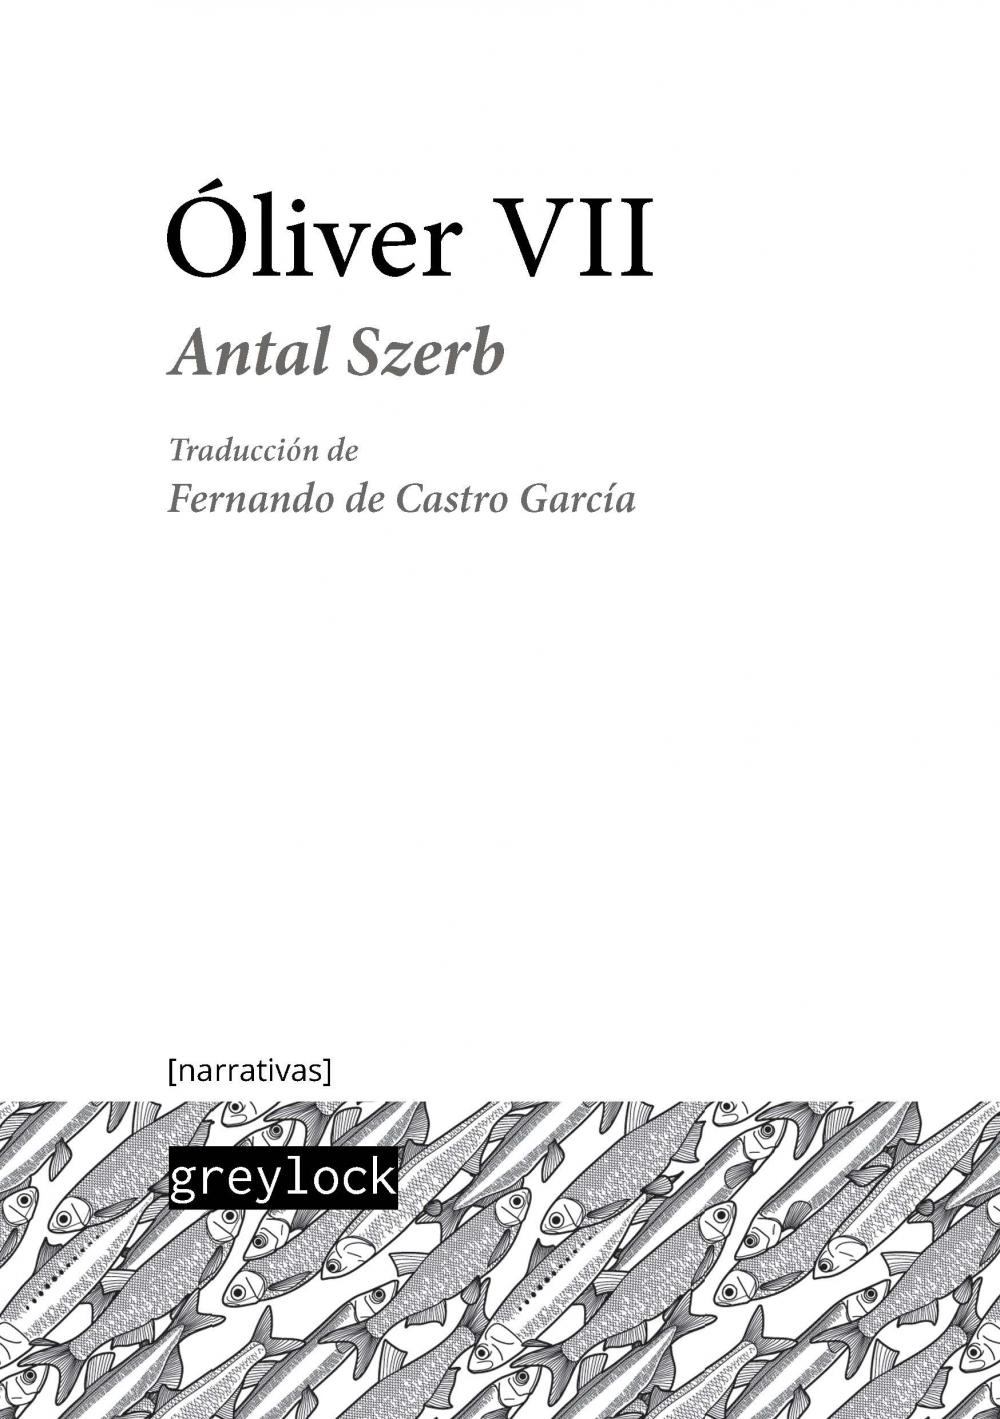 Óliver VII